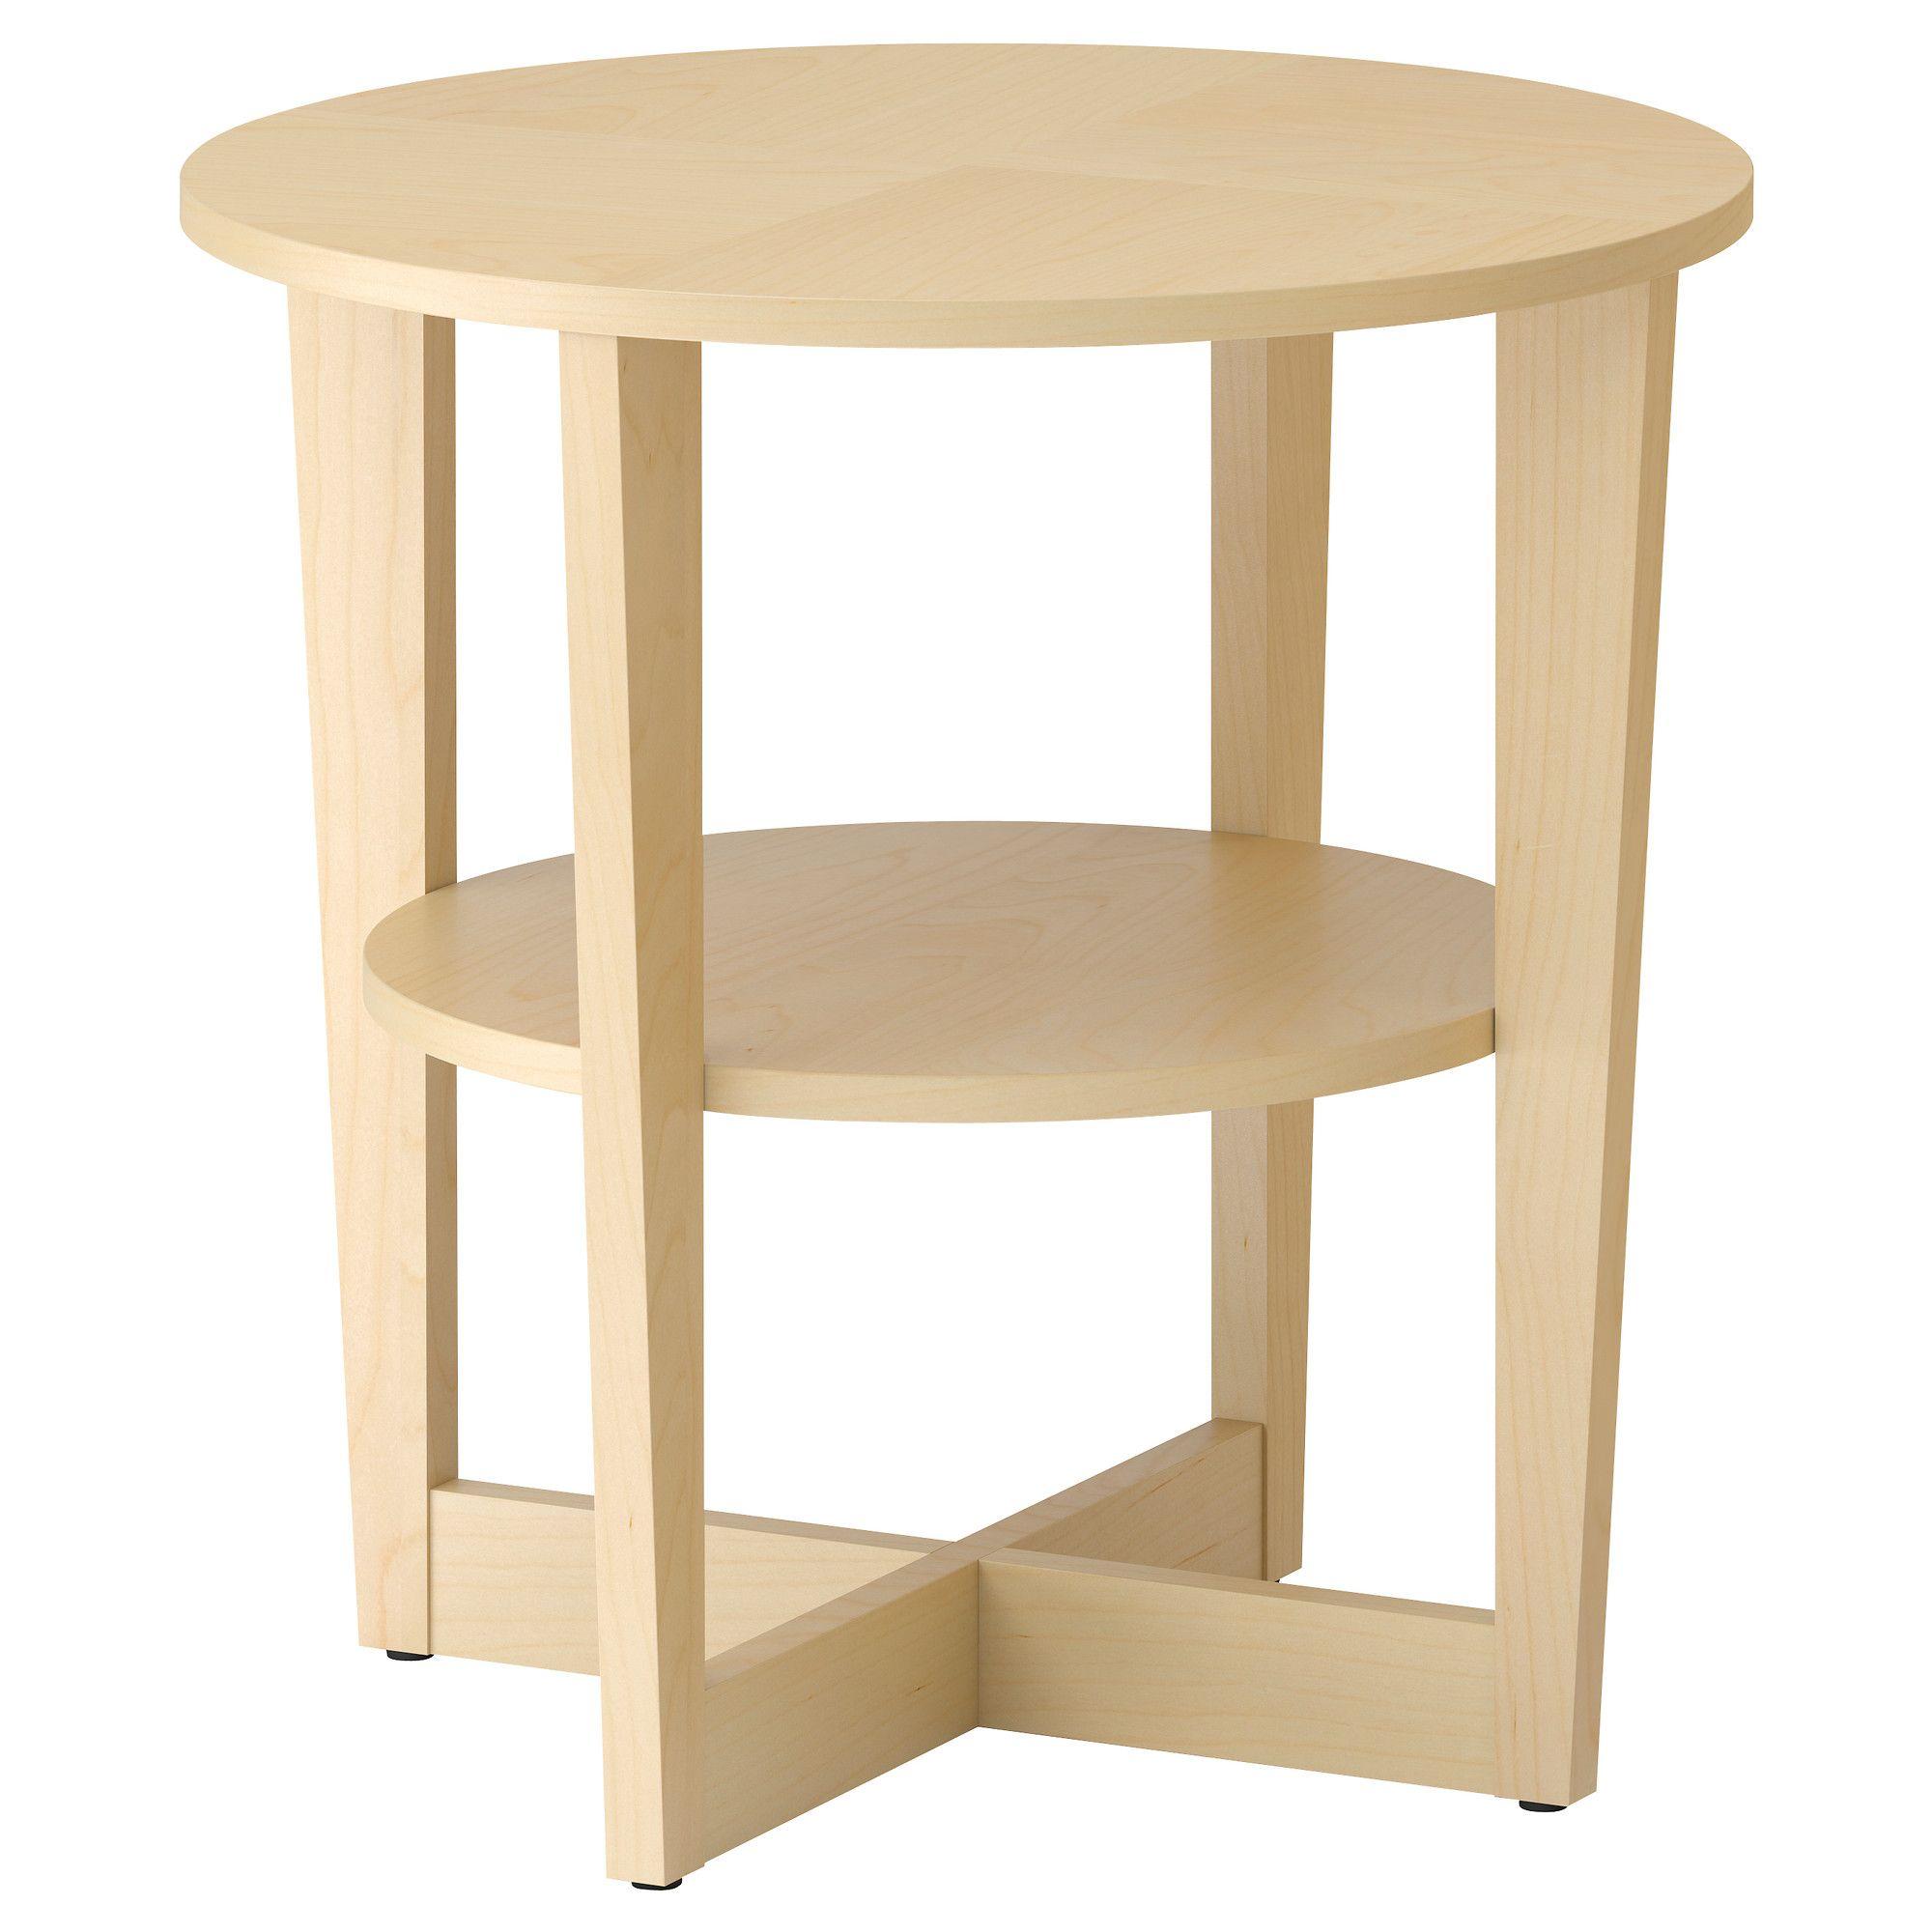 Ikea Us Furniture And Home Furnishings Dokumenter [ 2000 x 2000 Pixel ]